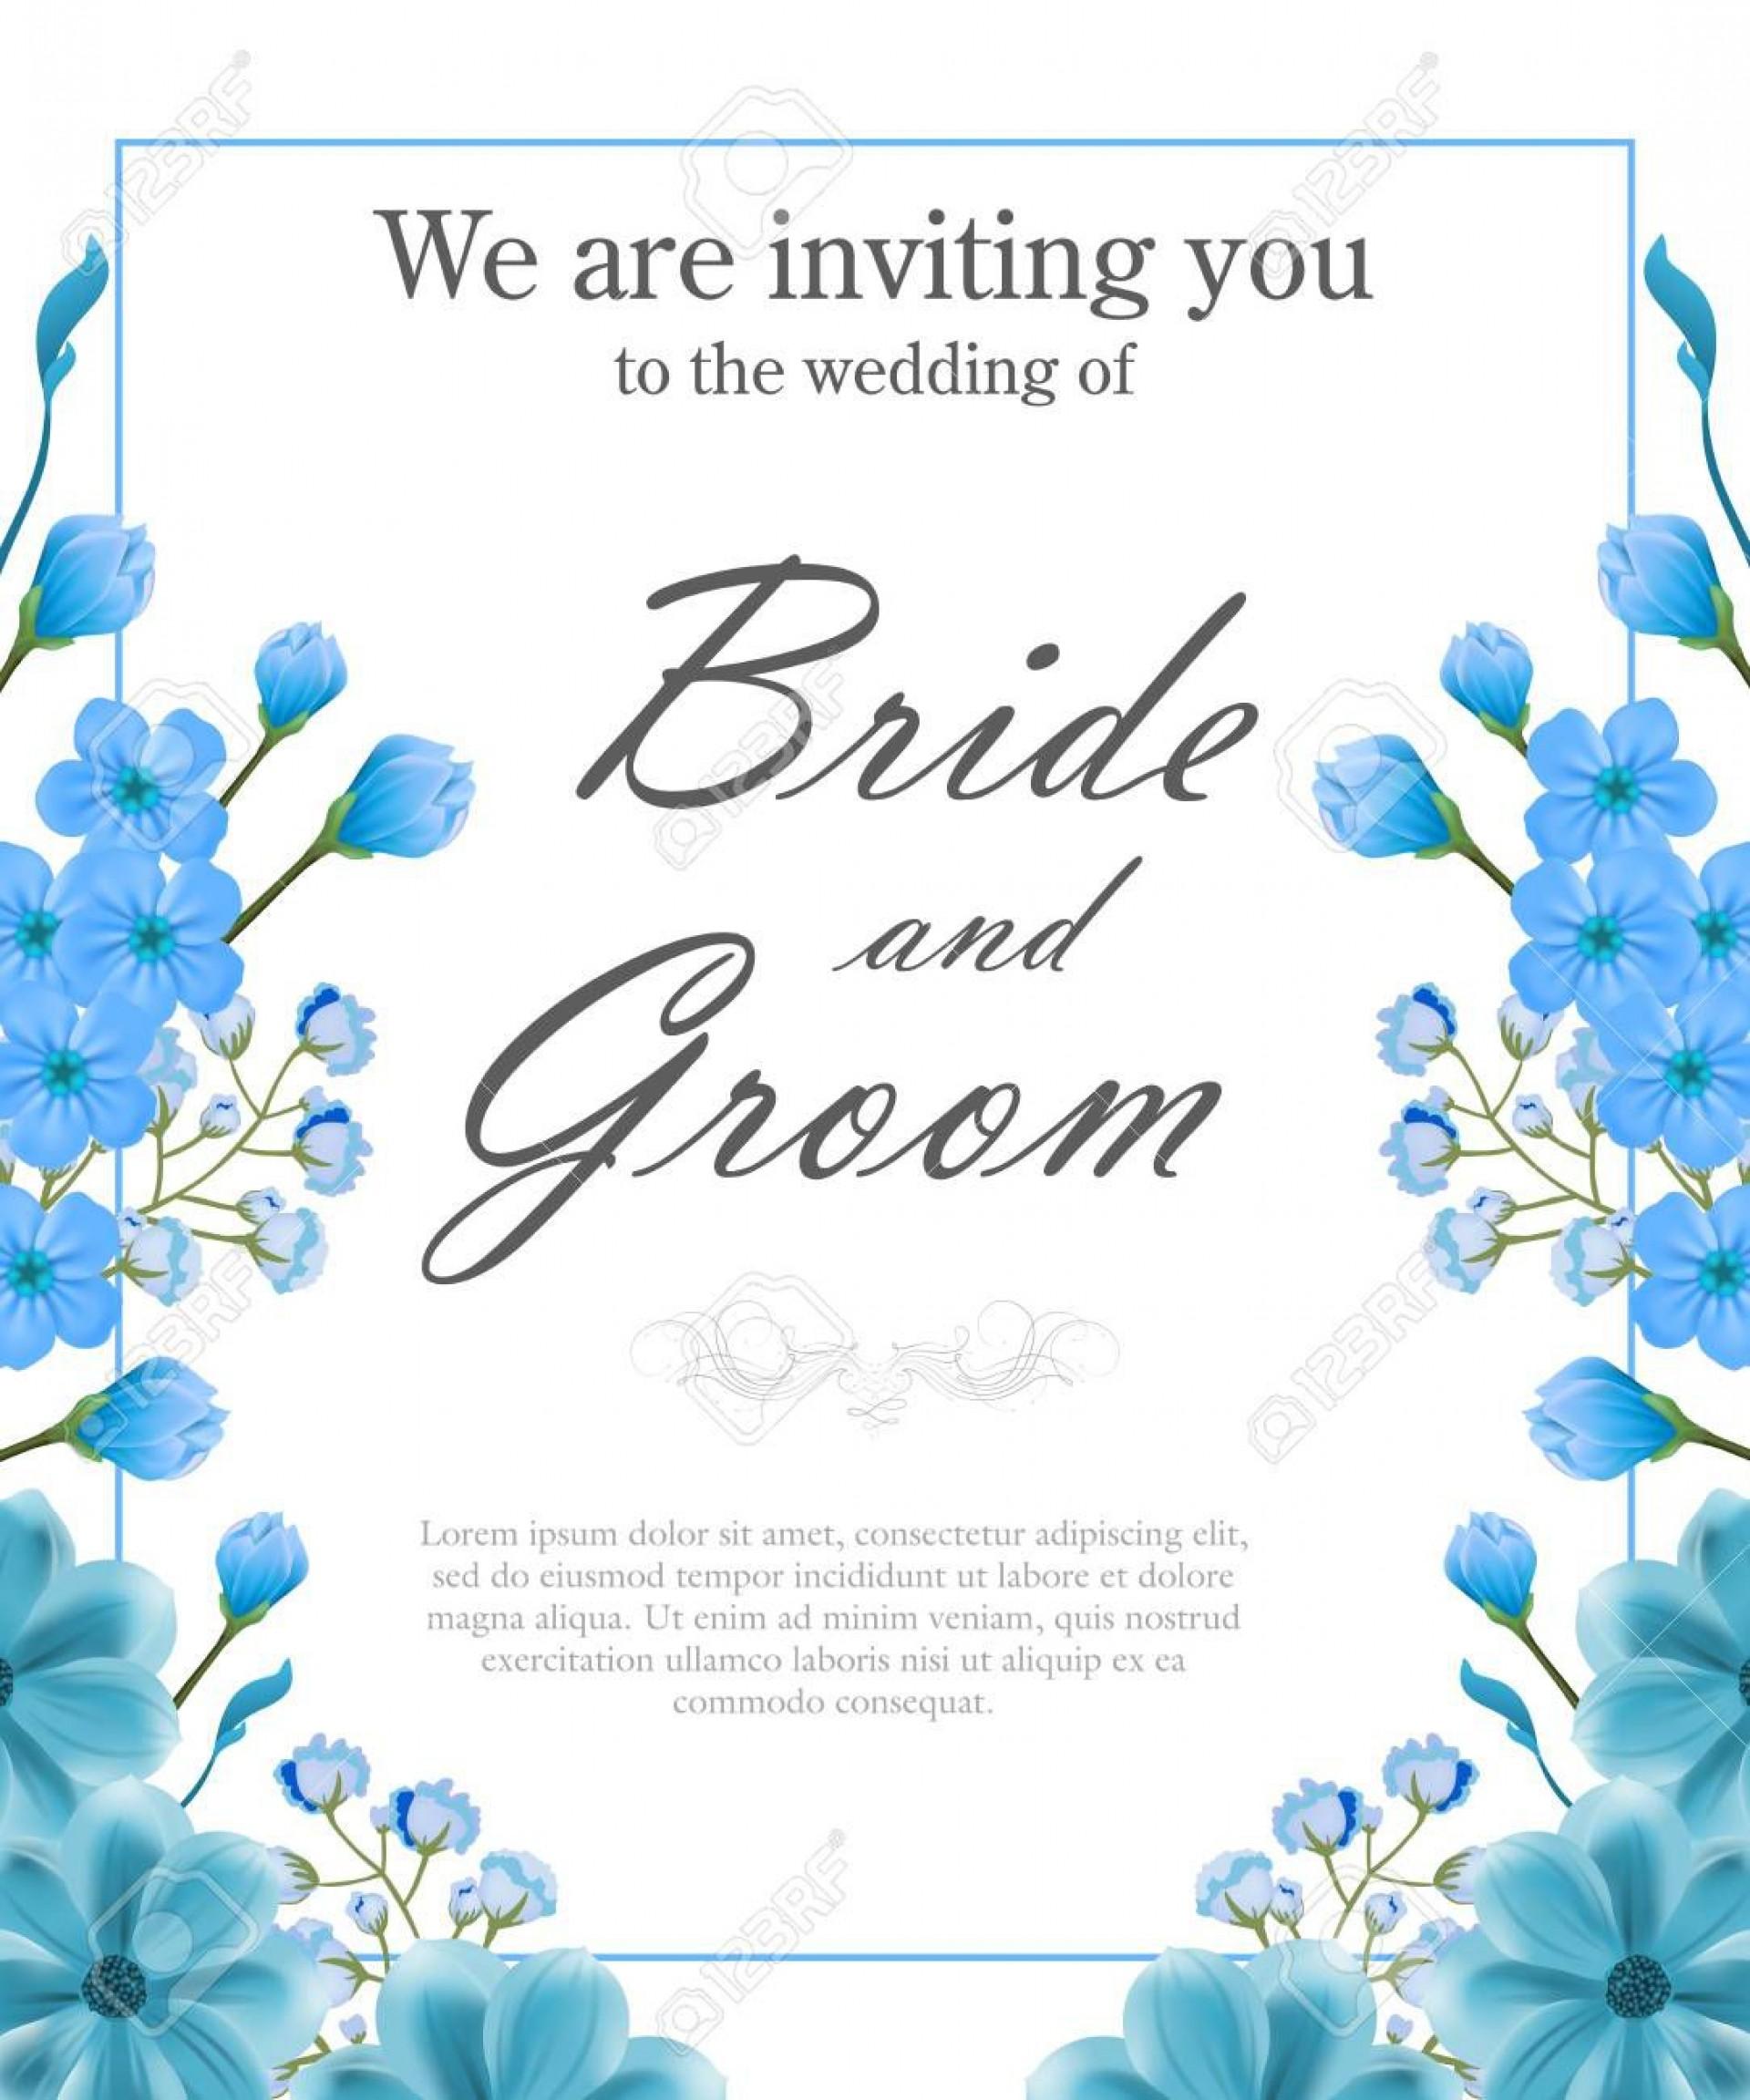 005 Imposing Sample Wedding Invitation Template Image  Templates Wording Card1920